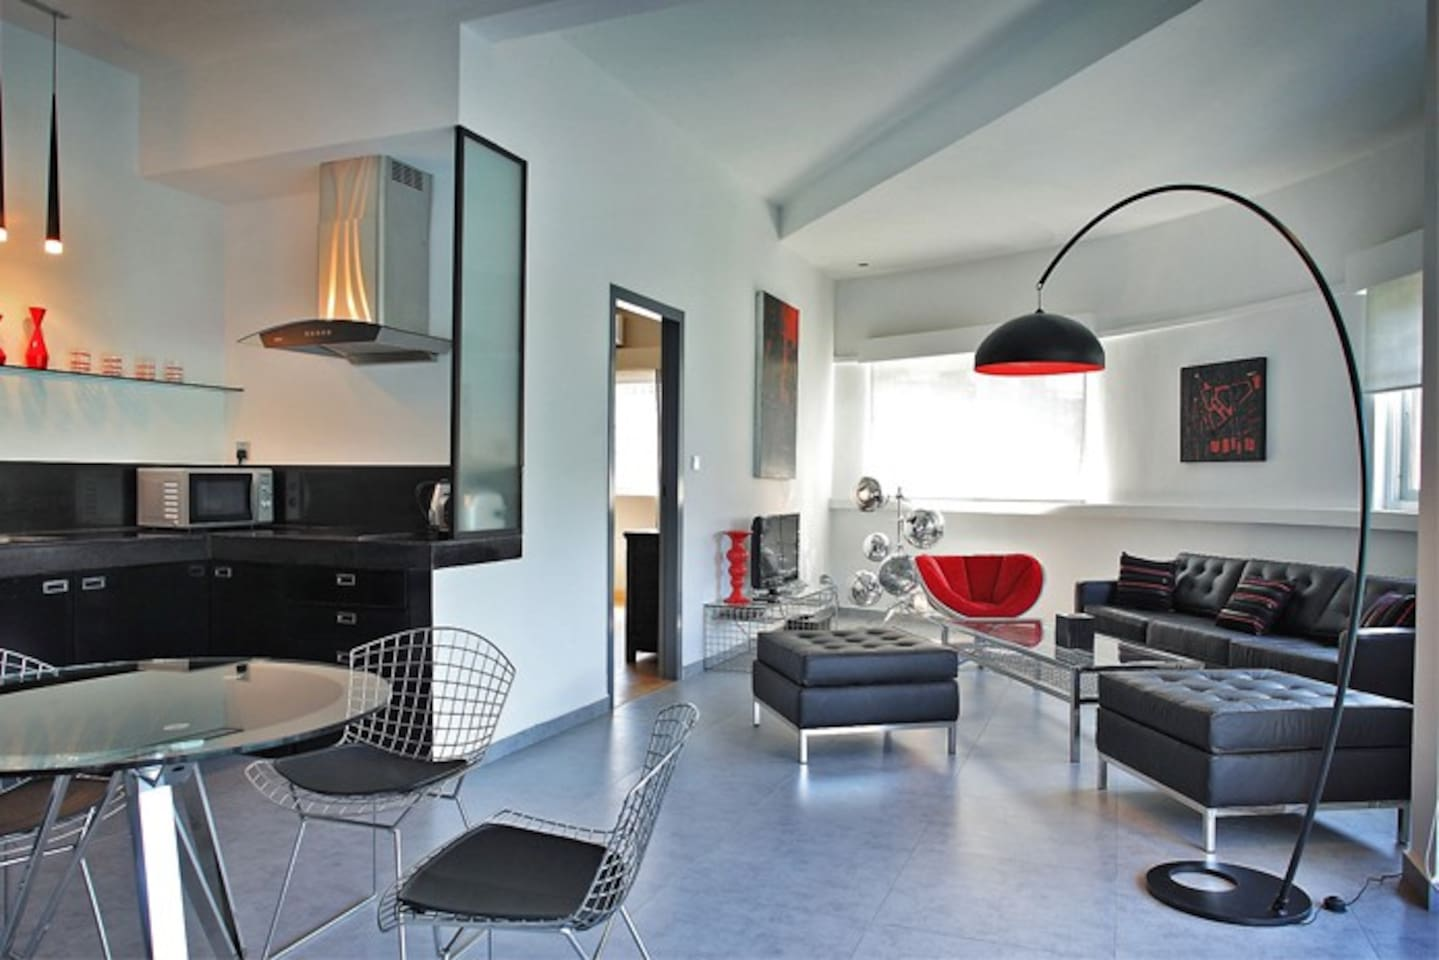 Living area - Open kitchen